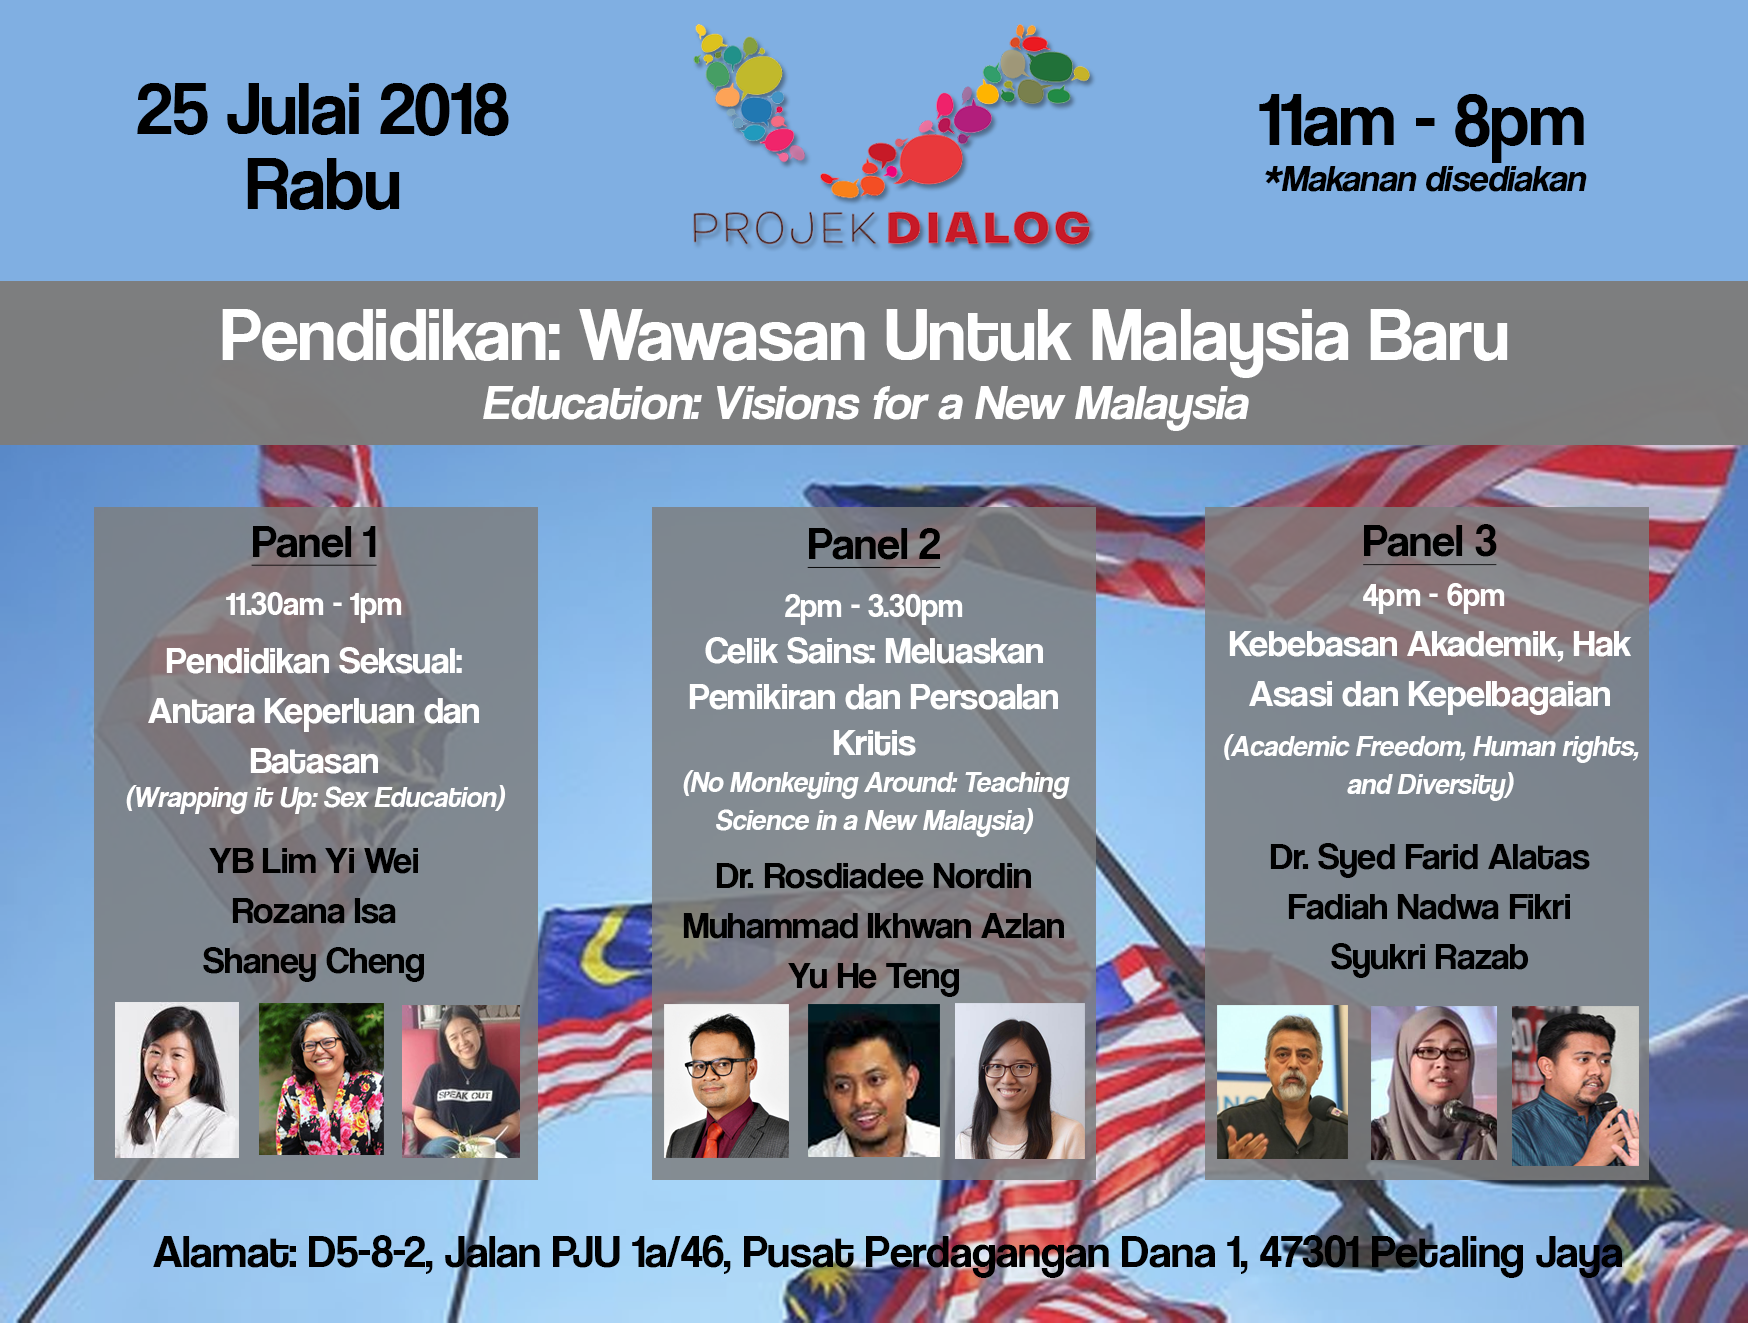 [Review]: Education: Visions for a New Malaysia / Pendidikan: Wawasan untuk Malaysia Baru